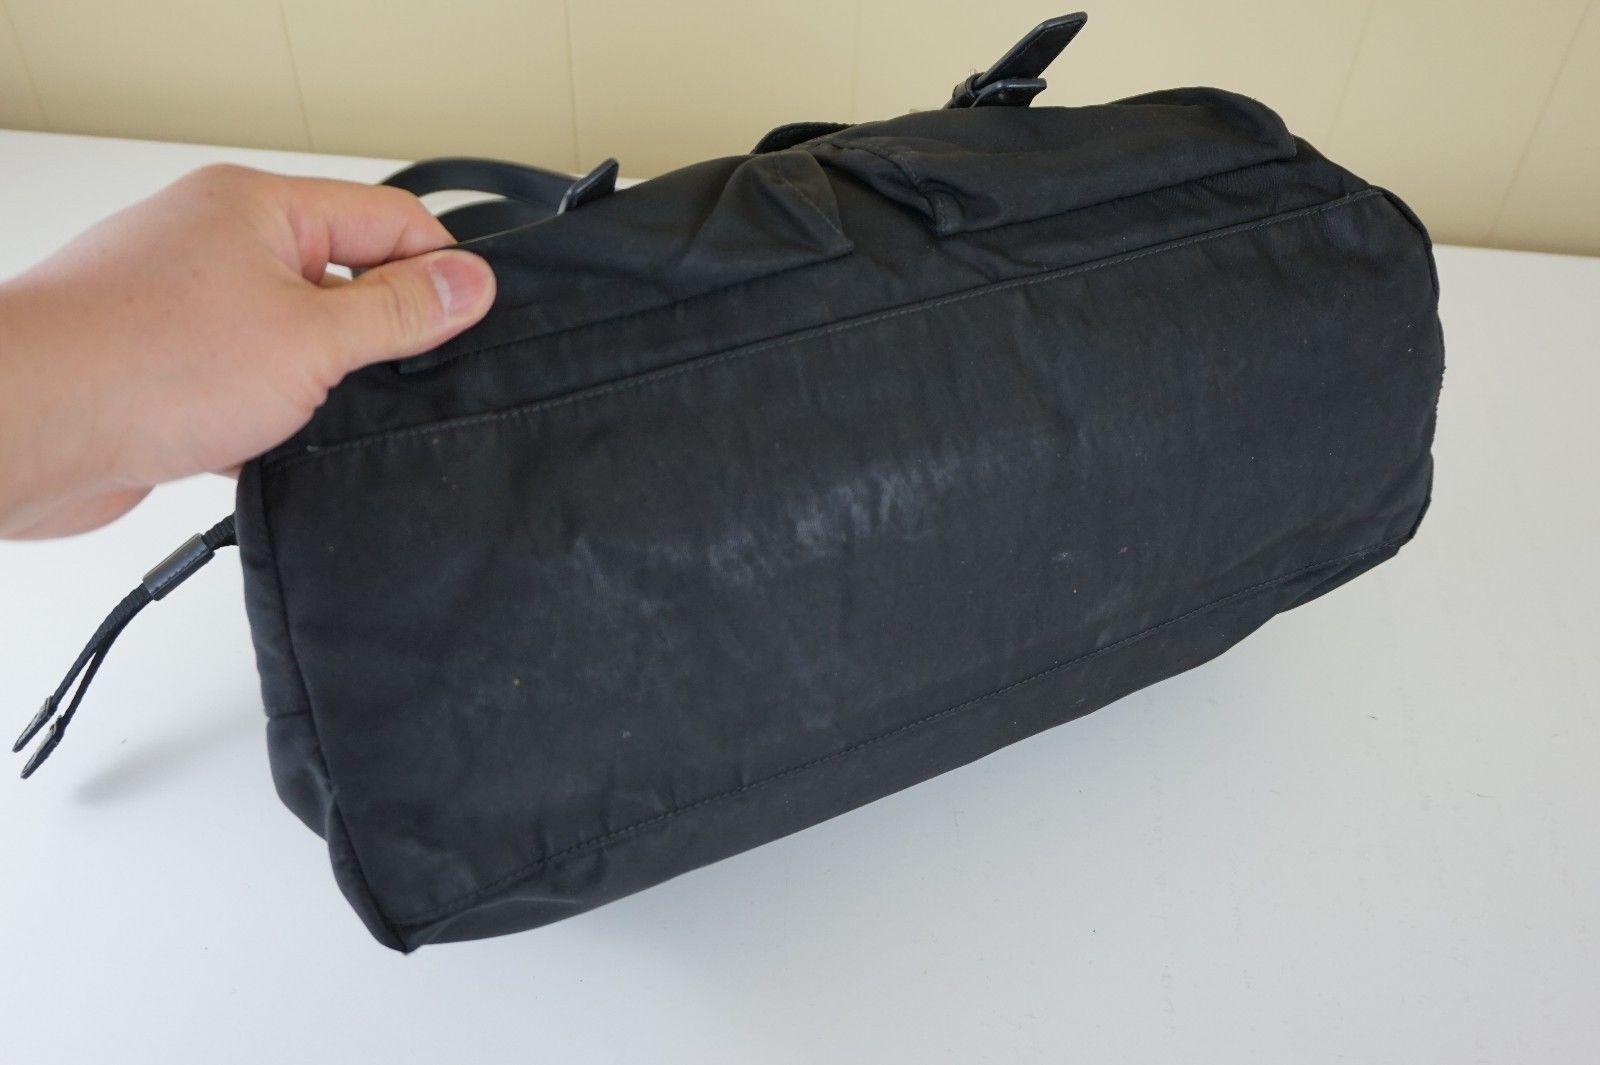 6bd5206e7633 ... australia authentic genuine prada black tessuto shoulder messenger bag  tote nylon purse 199.99 aab26 ac9ab